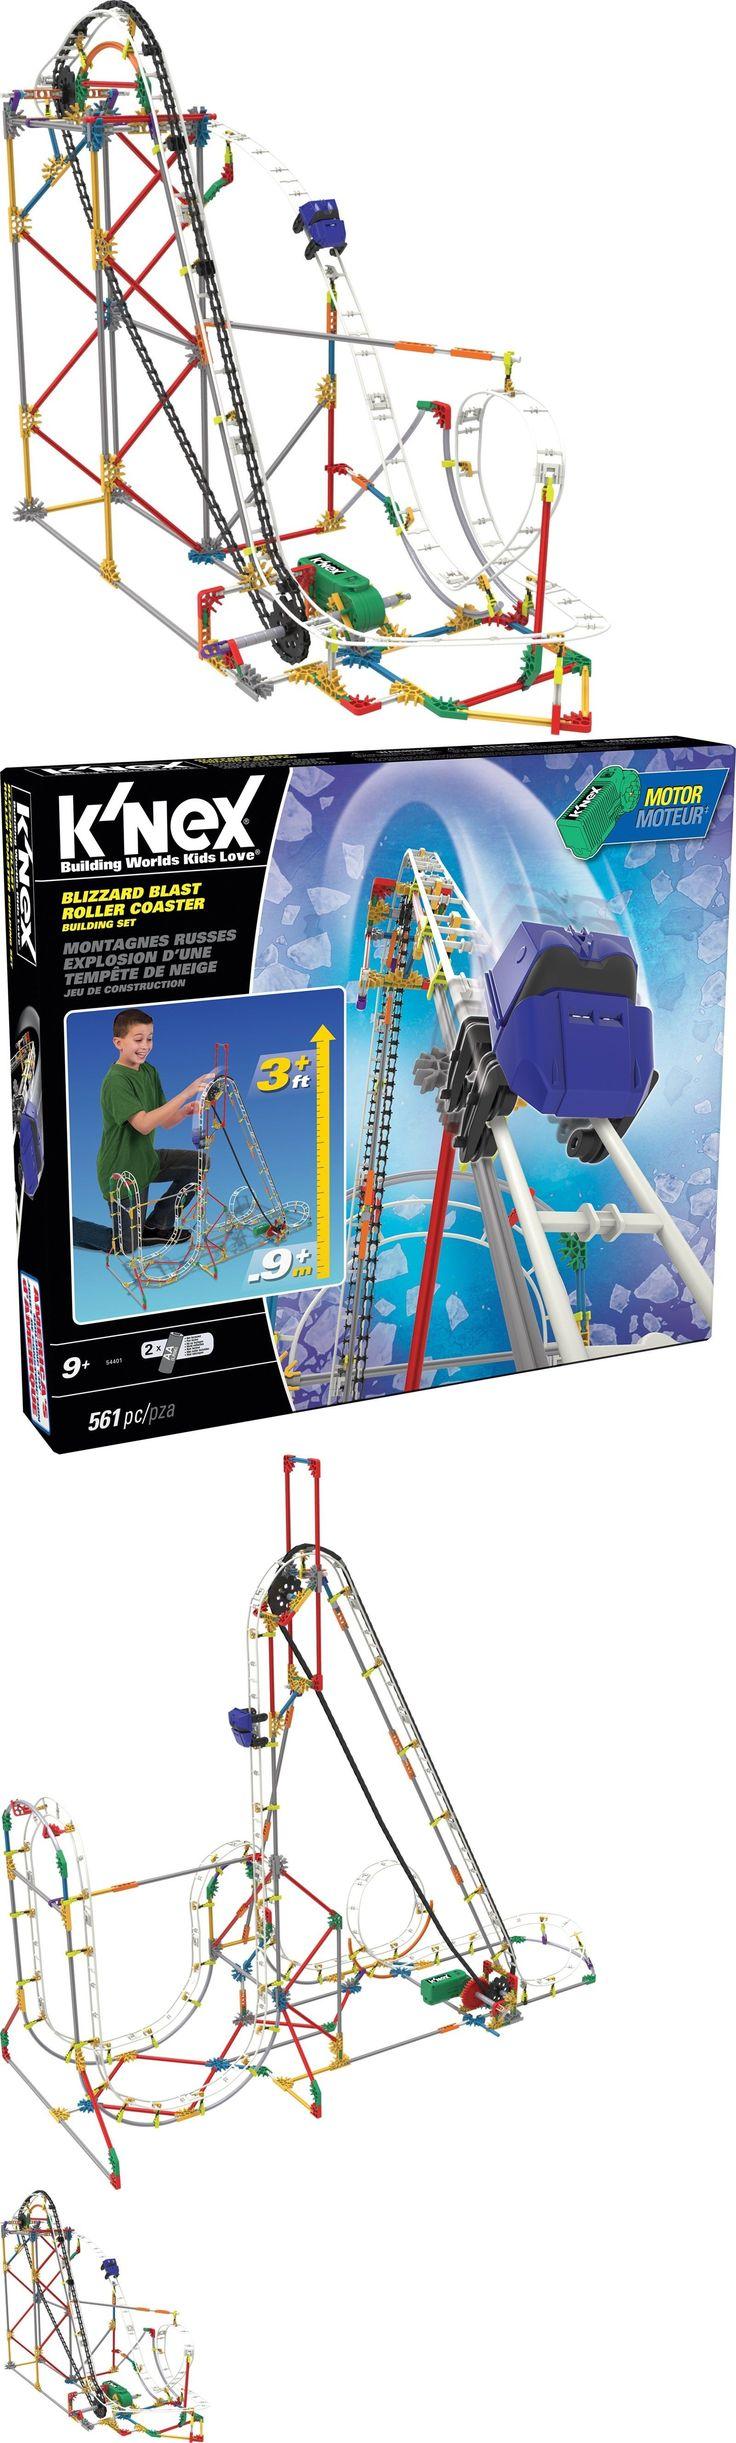 KNEX 21254: K Nex Blizzard Blast Roller Coaster Building Set -> BUY IT NOW ONLY: $58.17 on eBay!